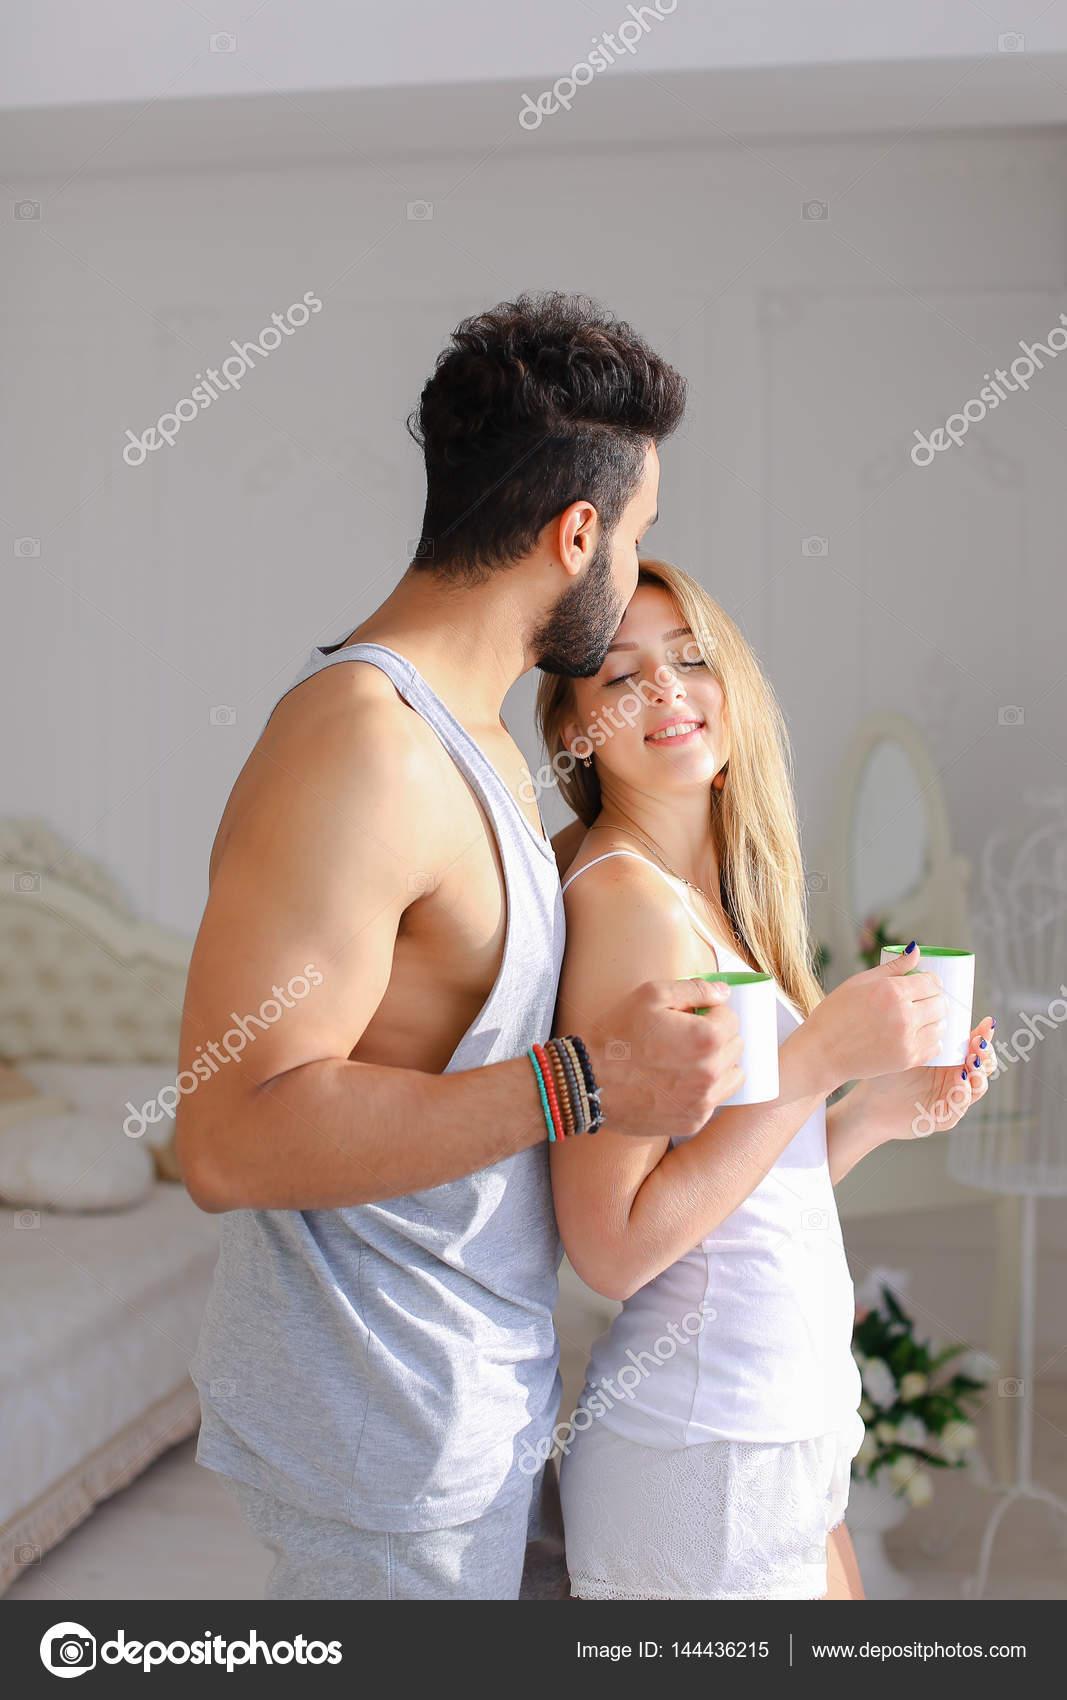 Картинки мужчина с женщиной ласкают друг друга фото 529-297